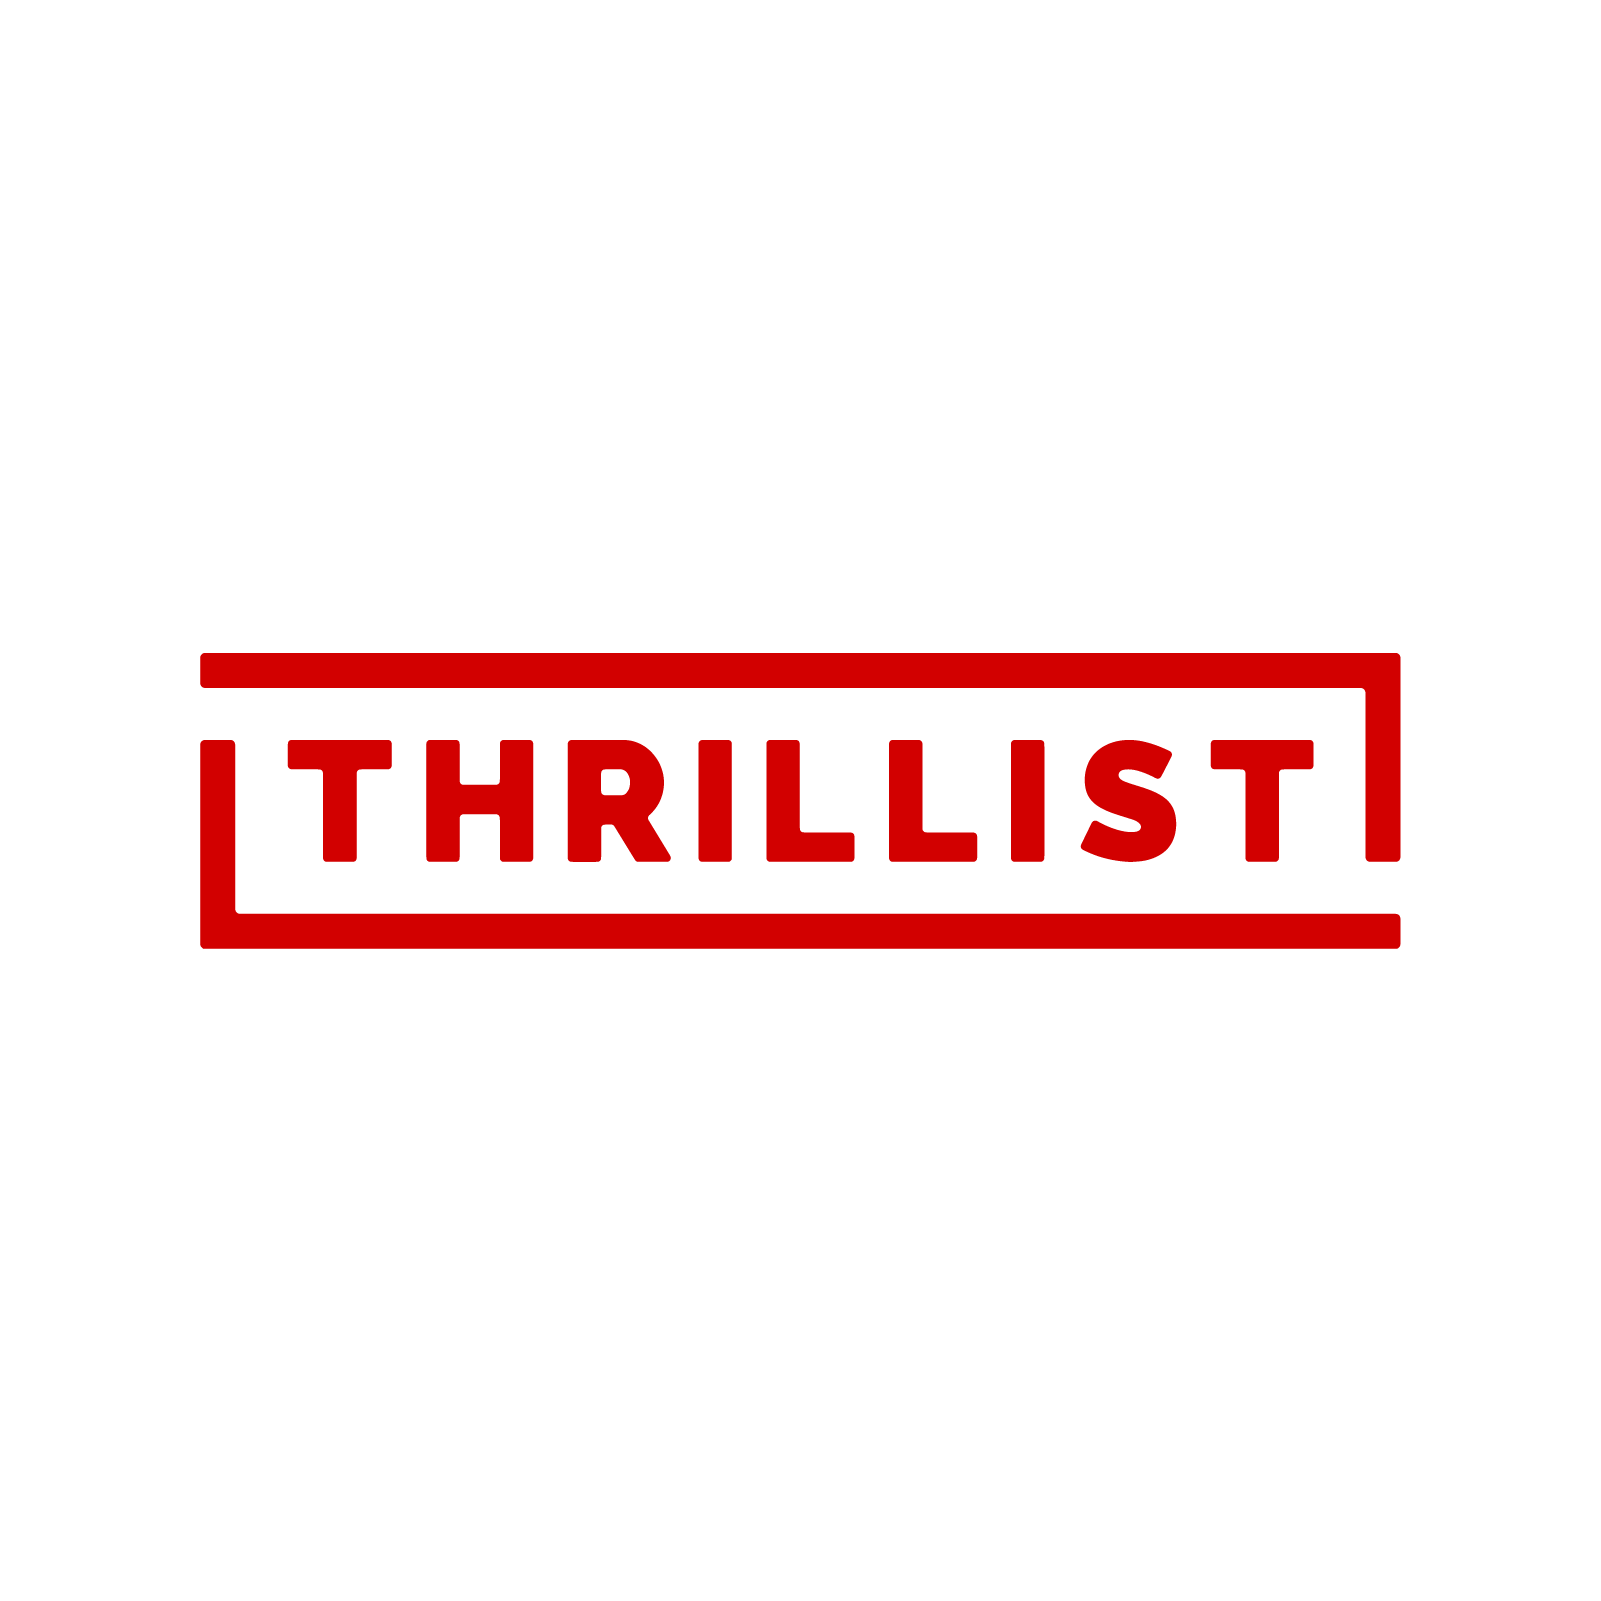 Press Logos_Thillist.png